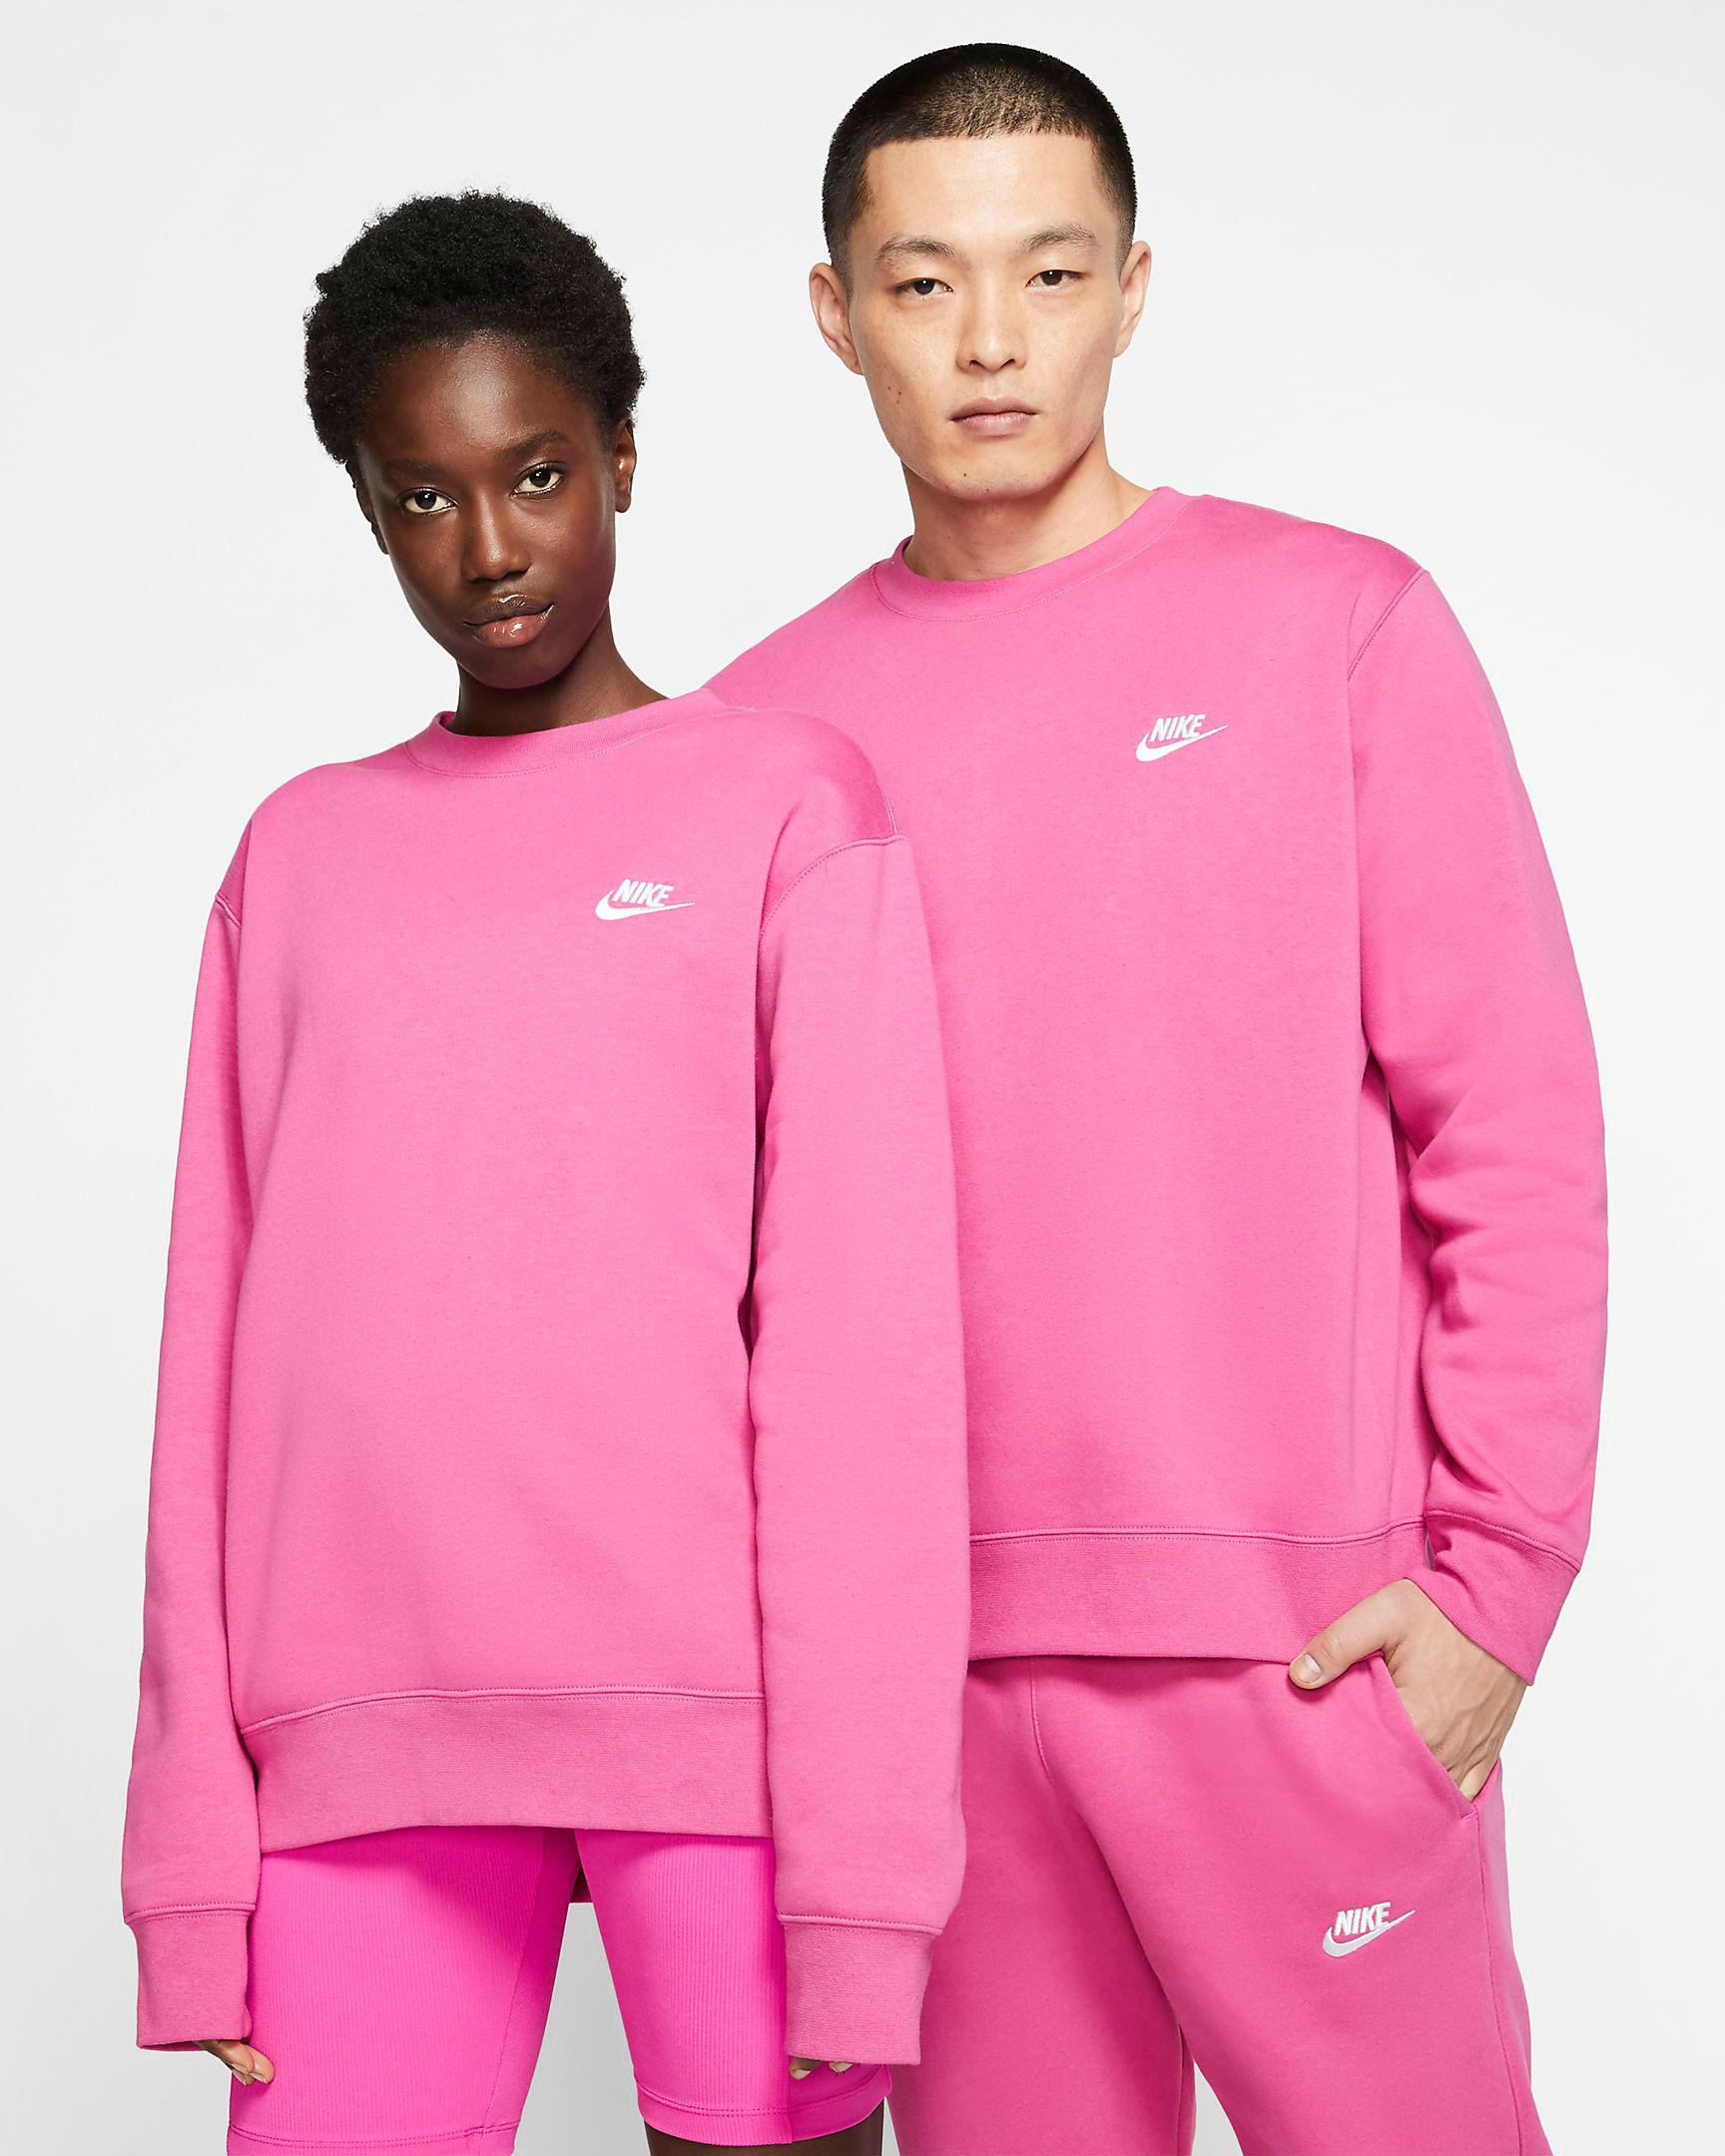 nike-sportswear-pink-fuschia-crew-sweatshirt